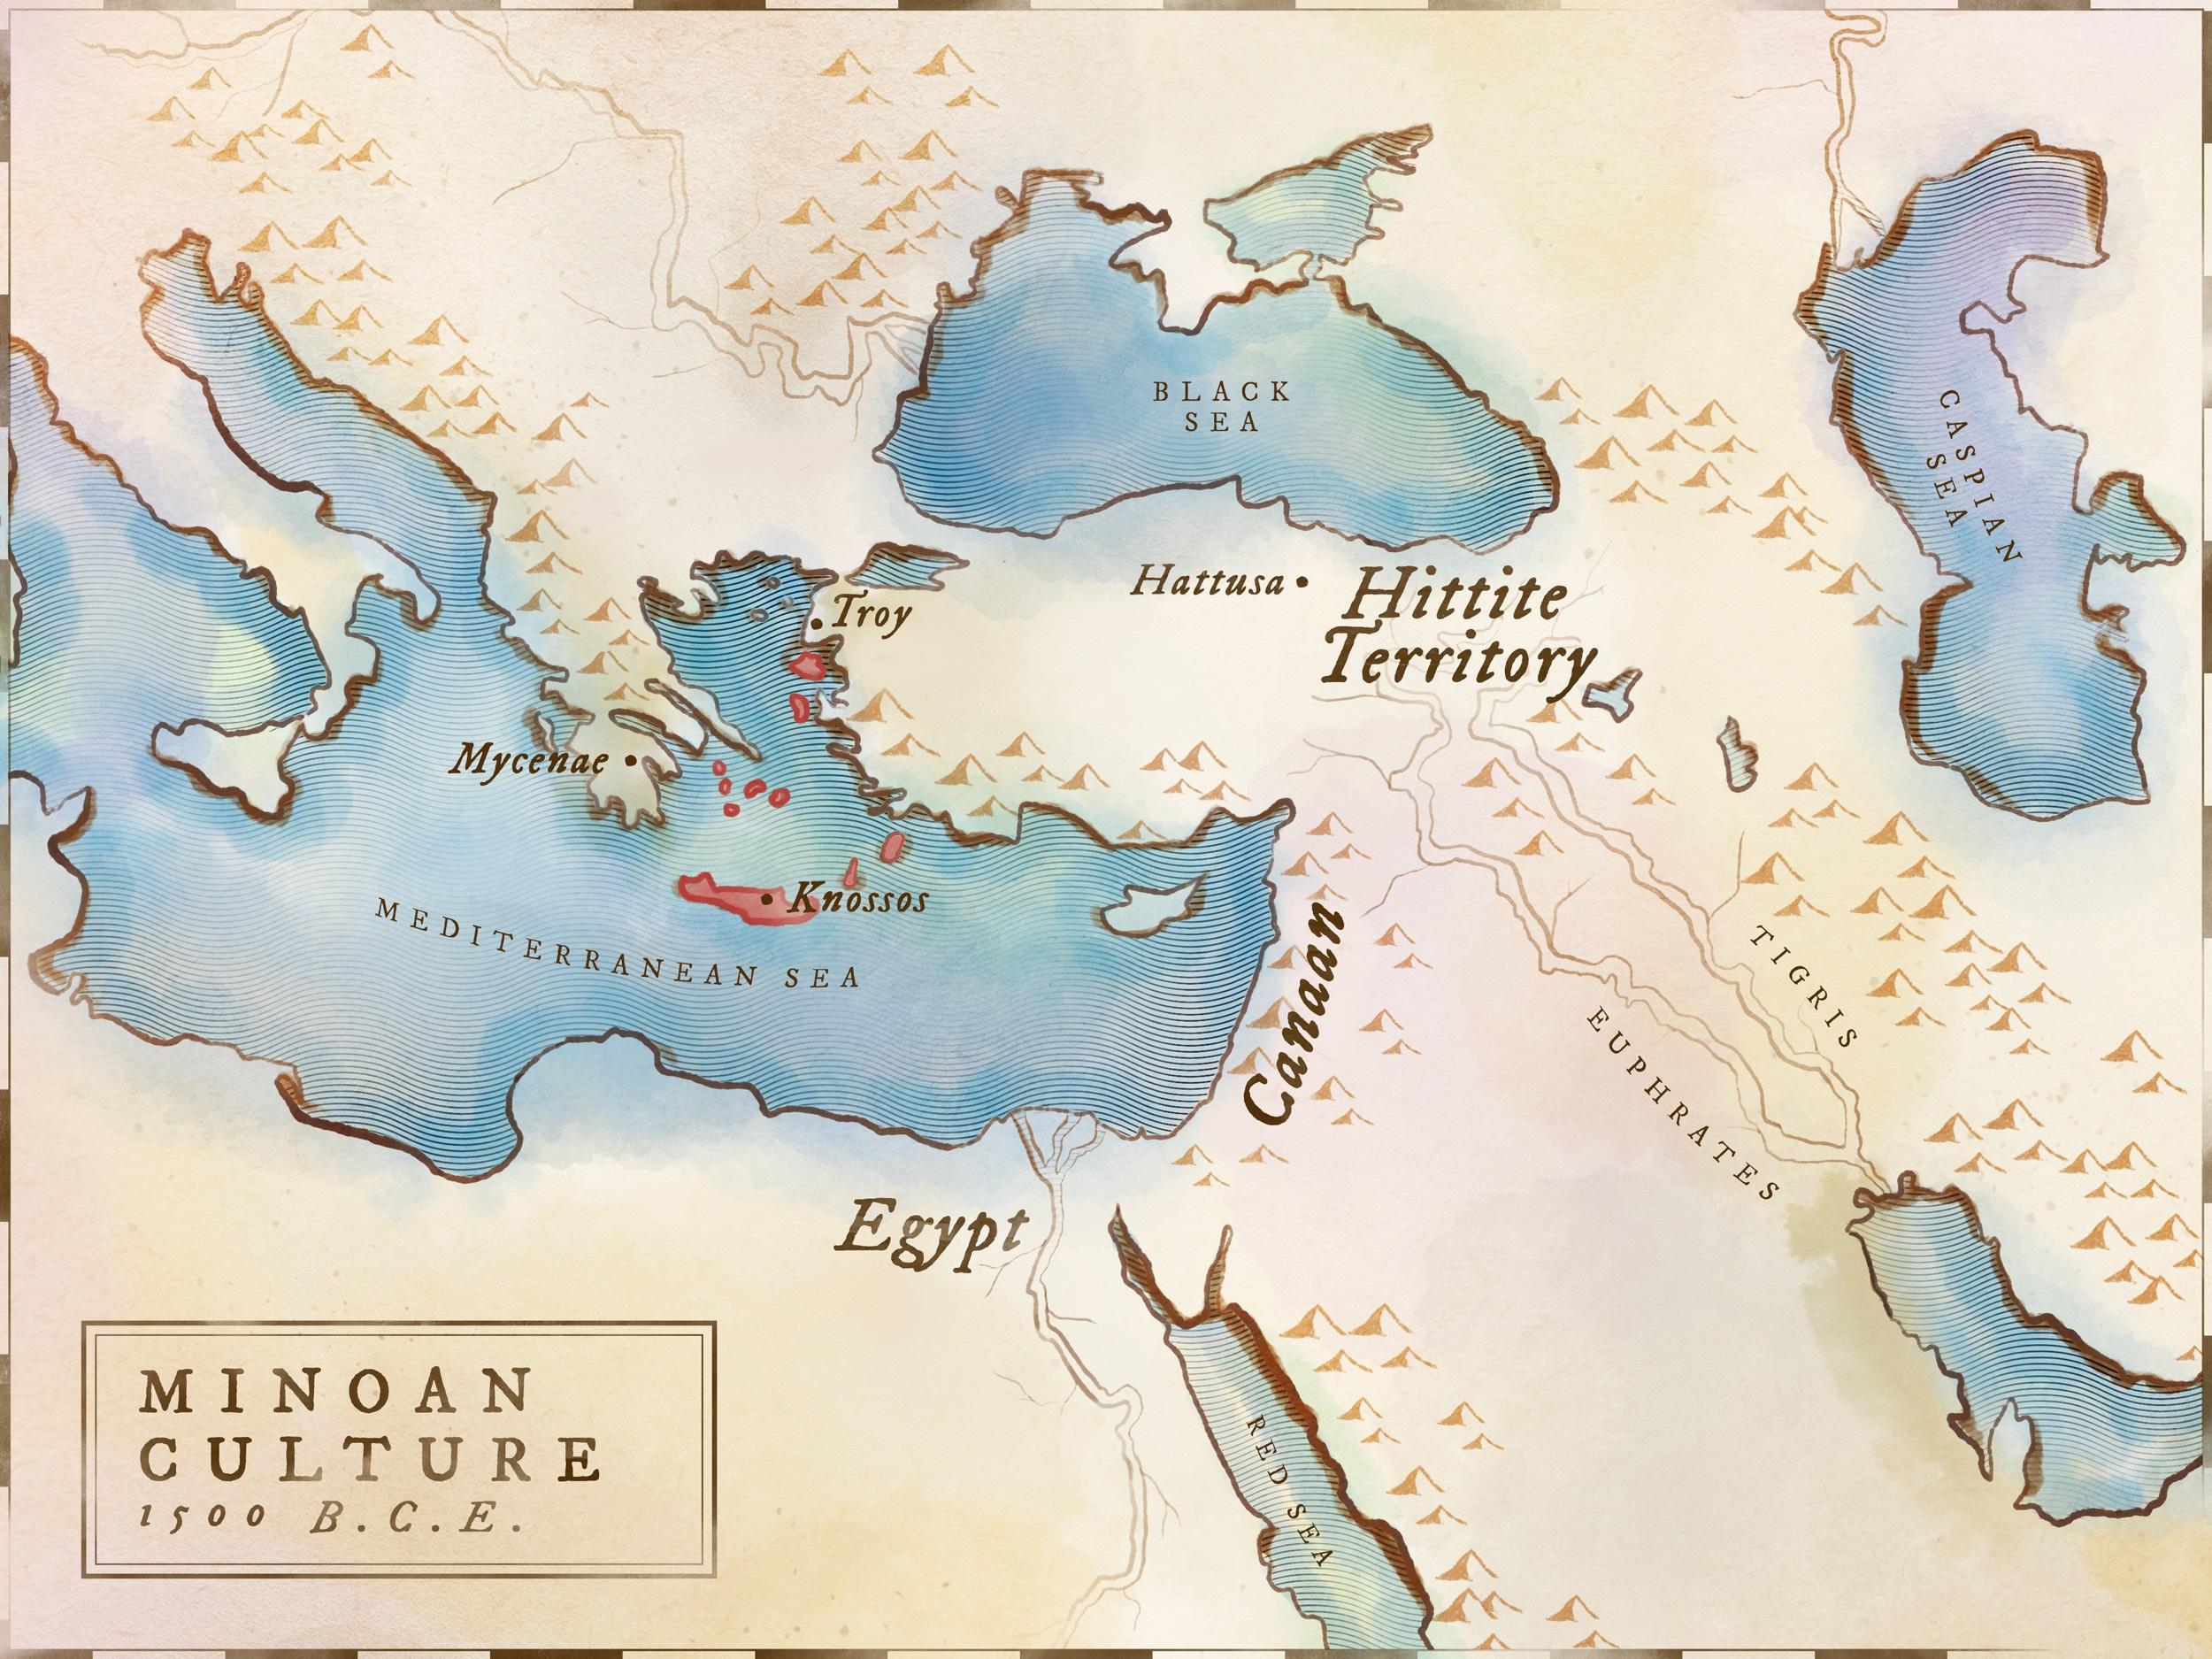 Ancient history timeline - Map Minoan civilization on Crete